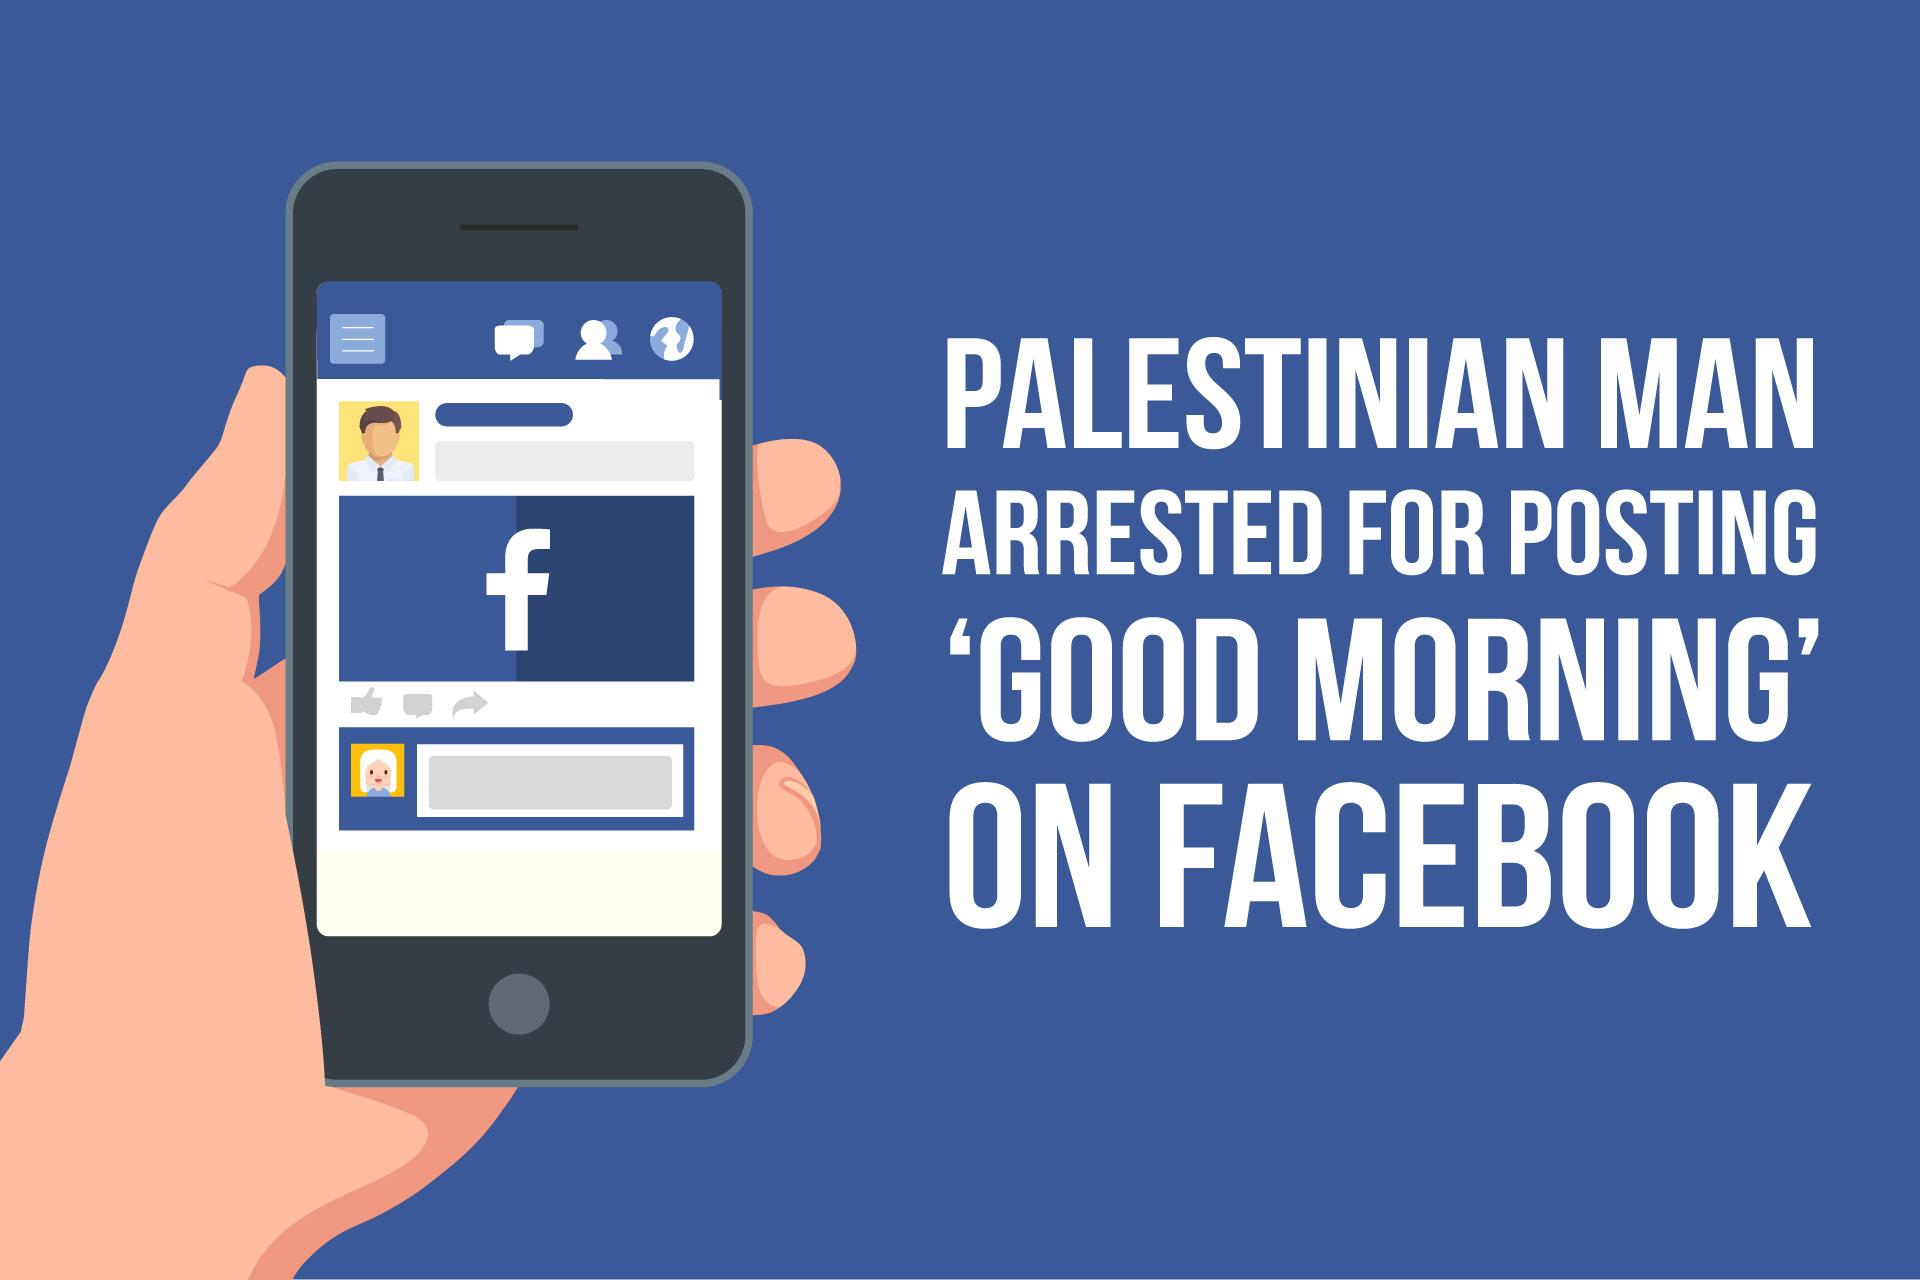 Palestinian man arrested for posting 'good morning' on Facebook